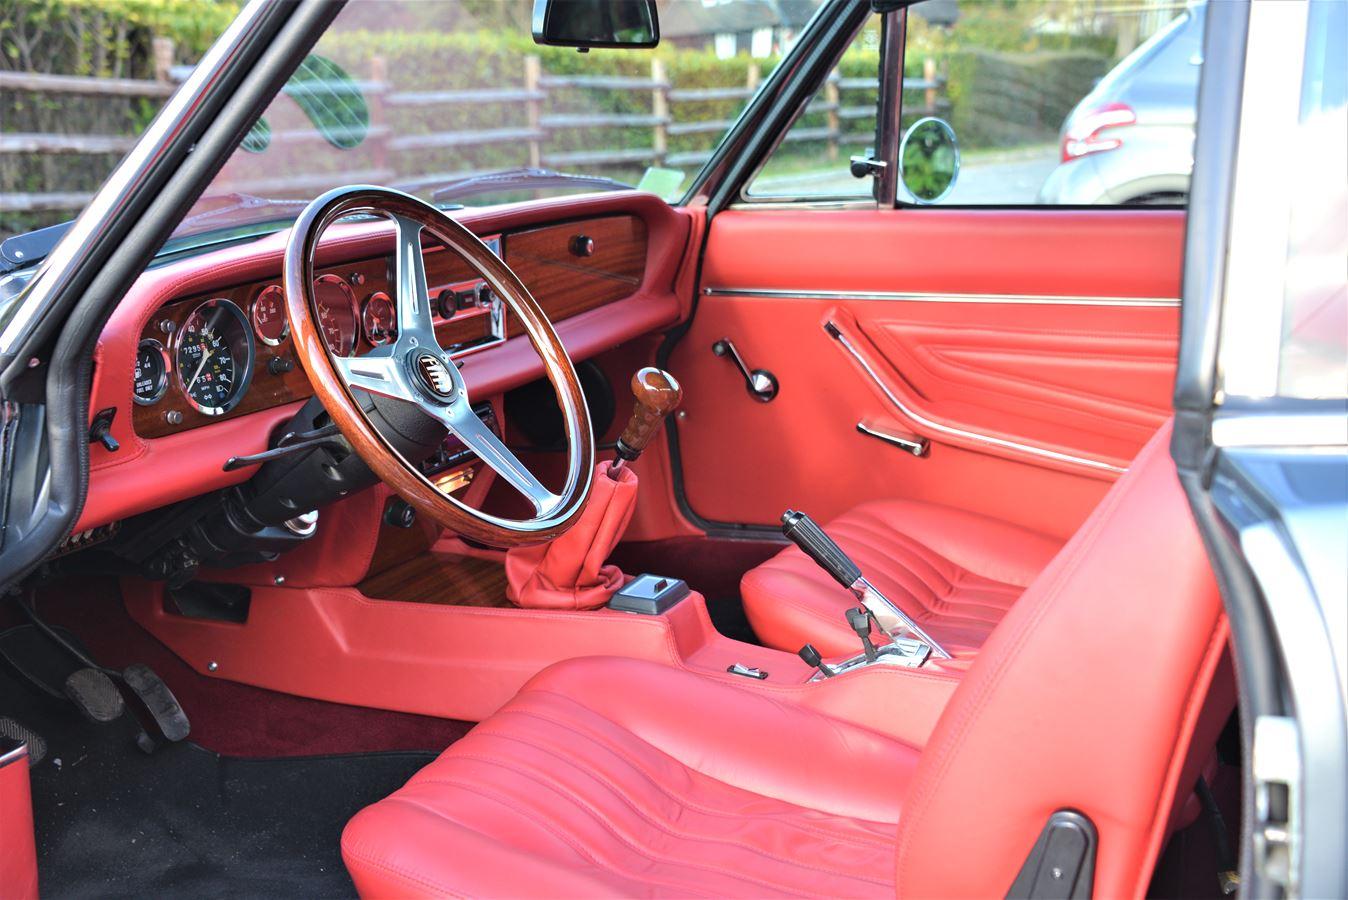 fiat 124 spider cs0 1981 arnold classic oldtimer restauration sattlerei. Black Bedroom Furniture Sets. Home Design Ideas